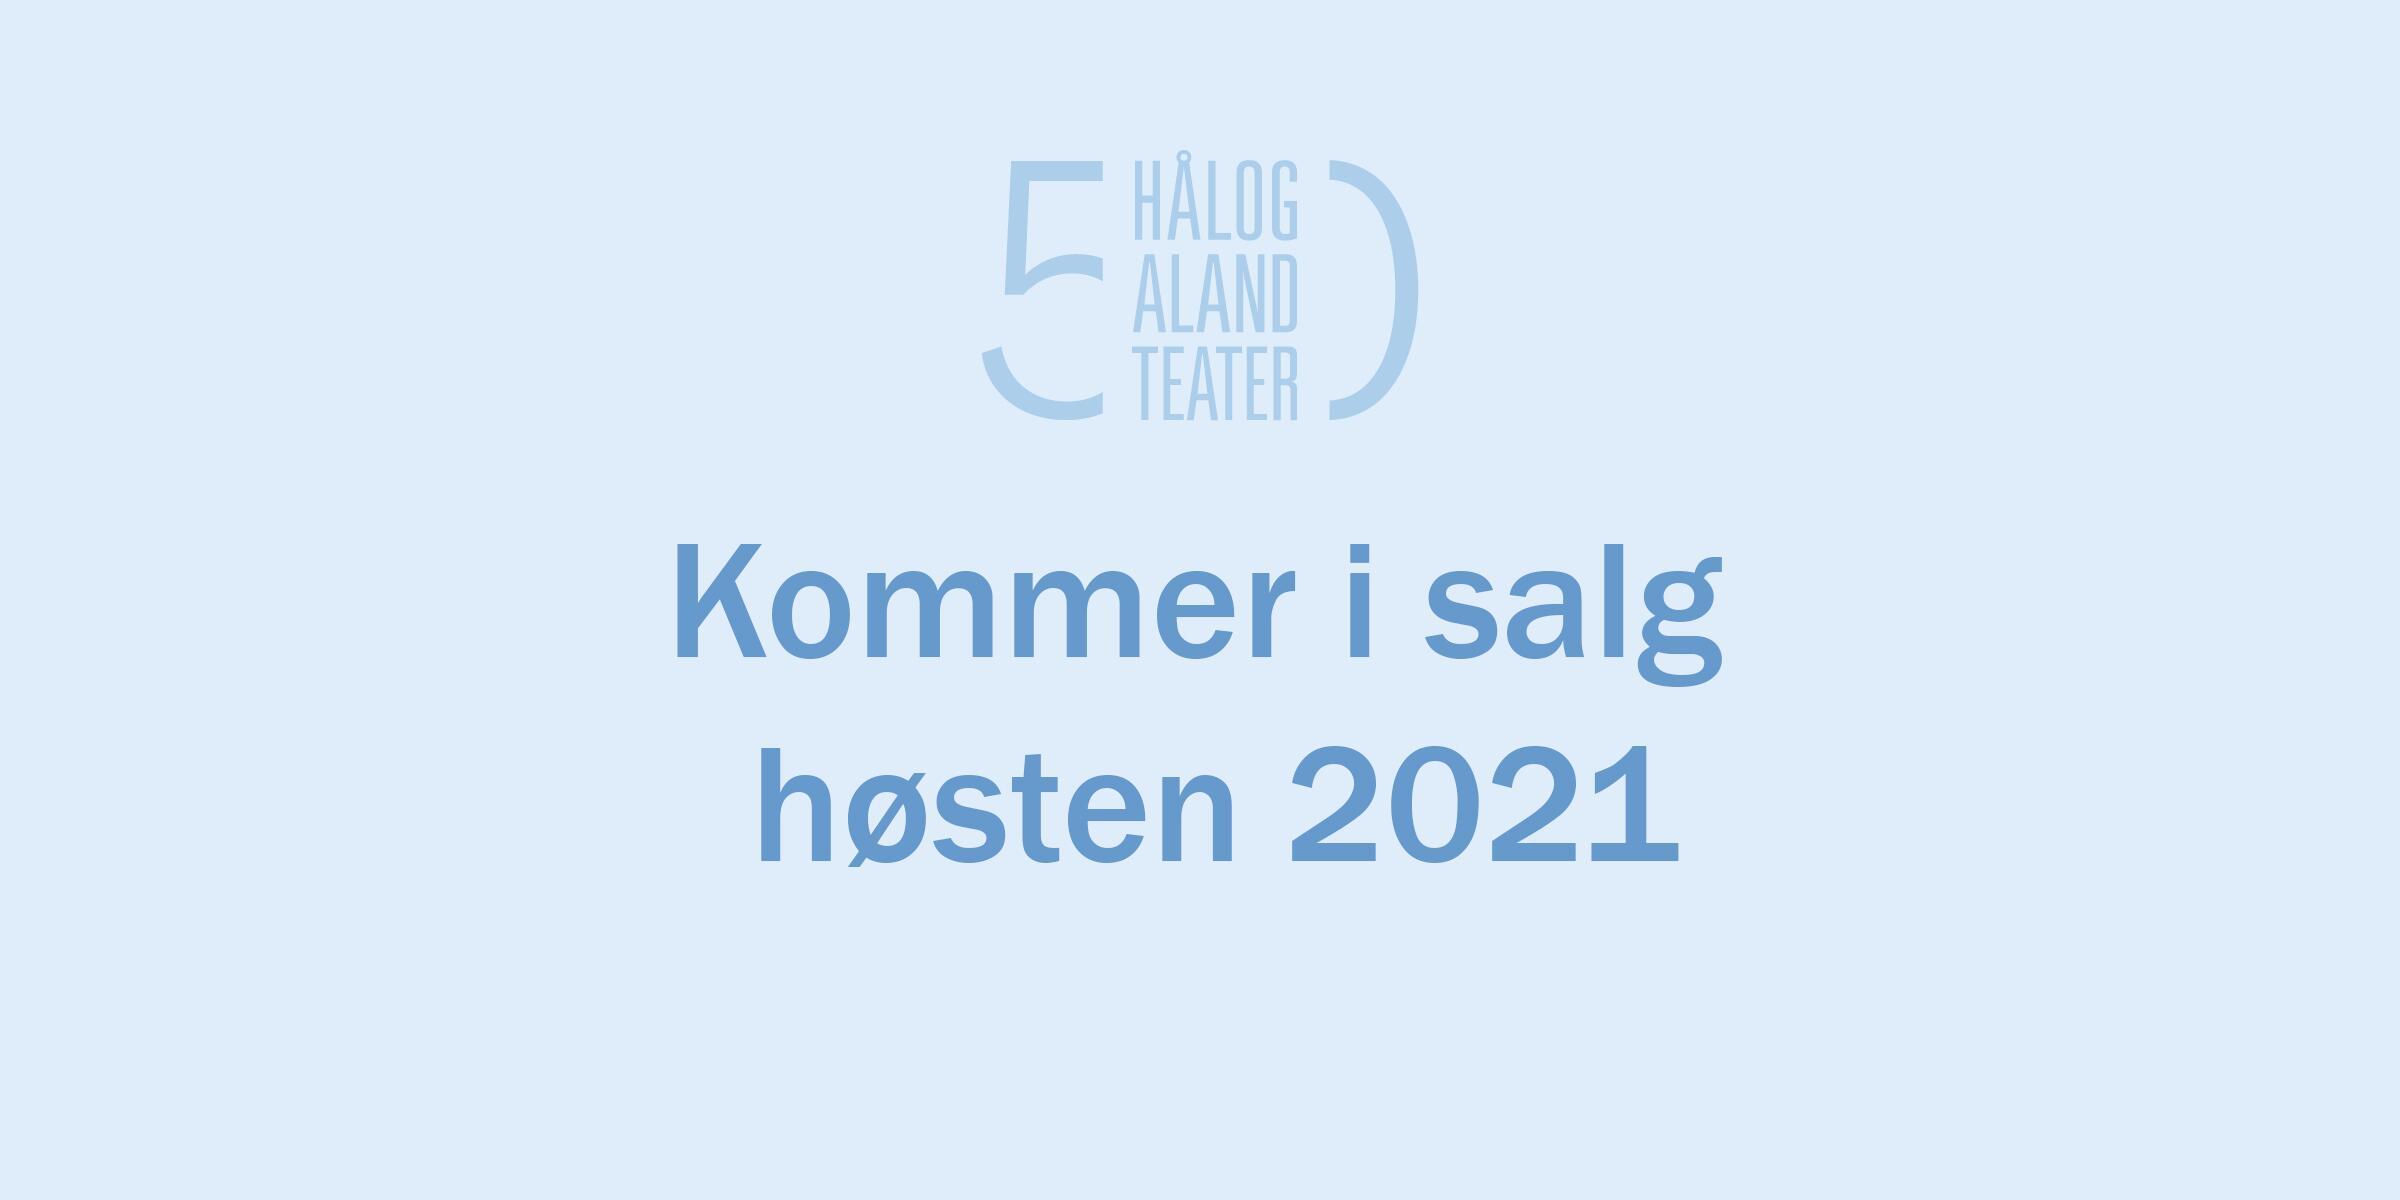 Hammerfest |HT - Hålogaland Teater